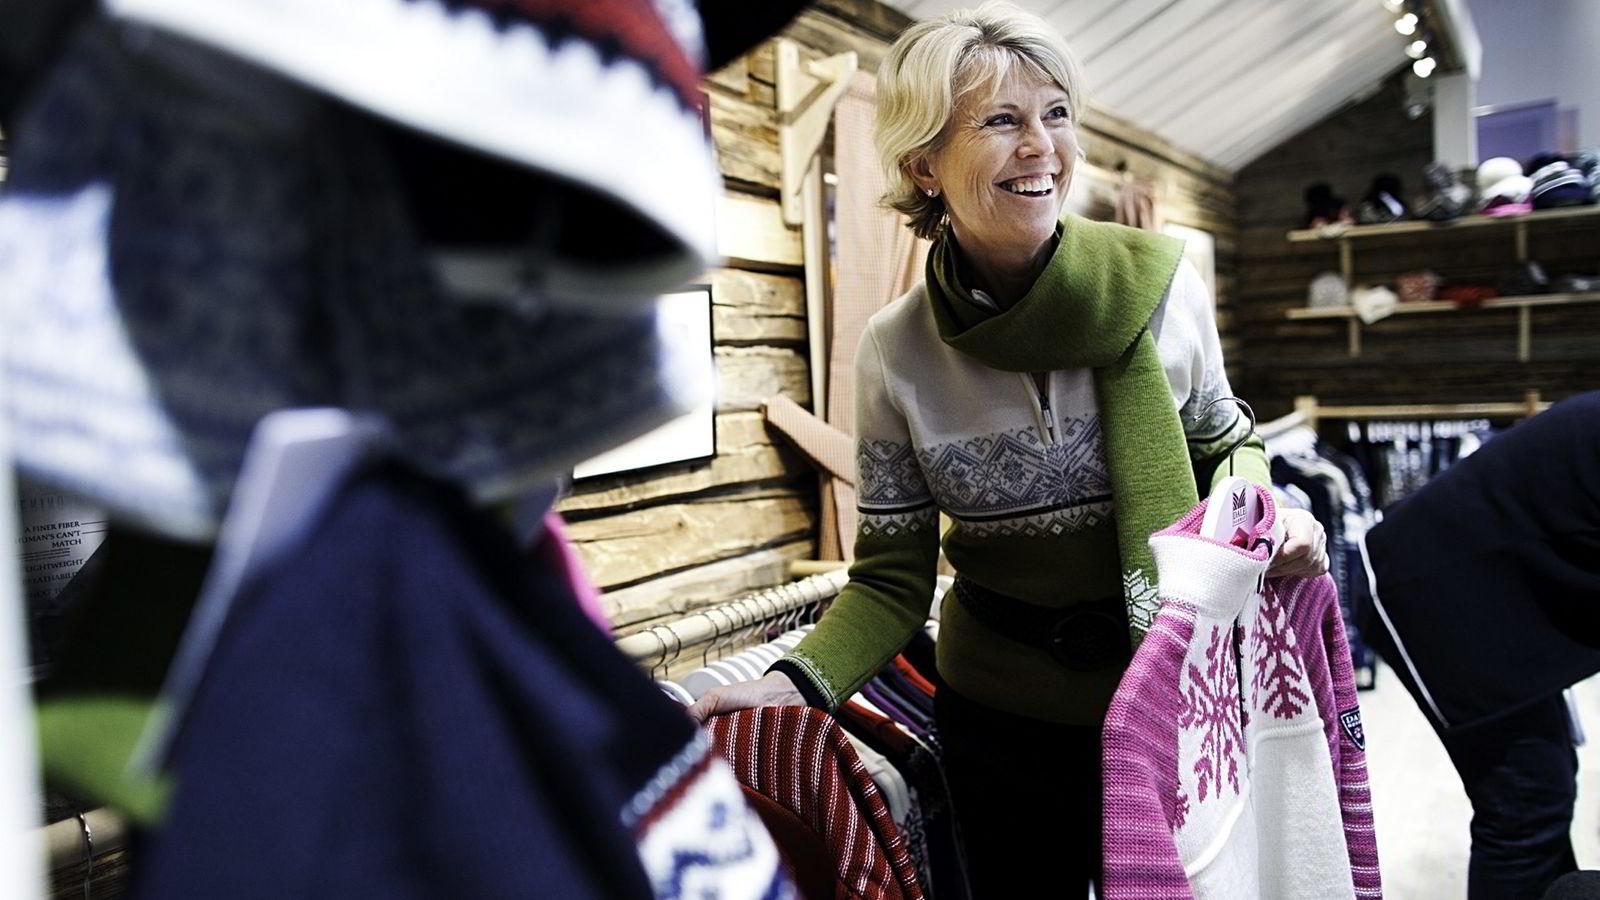 Hilde Midthjell i Dale of Norway er Norges første kvinnelige milliardær med selvskapt formue. Foto: Per Thrana